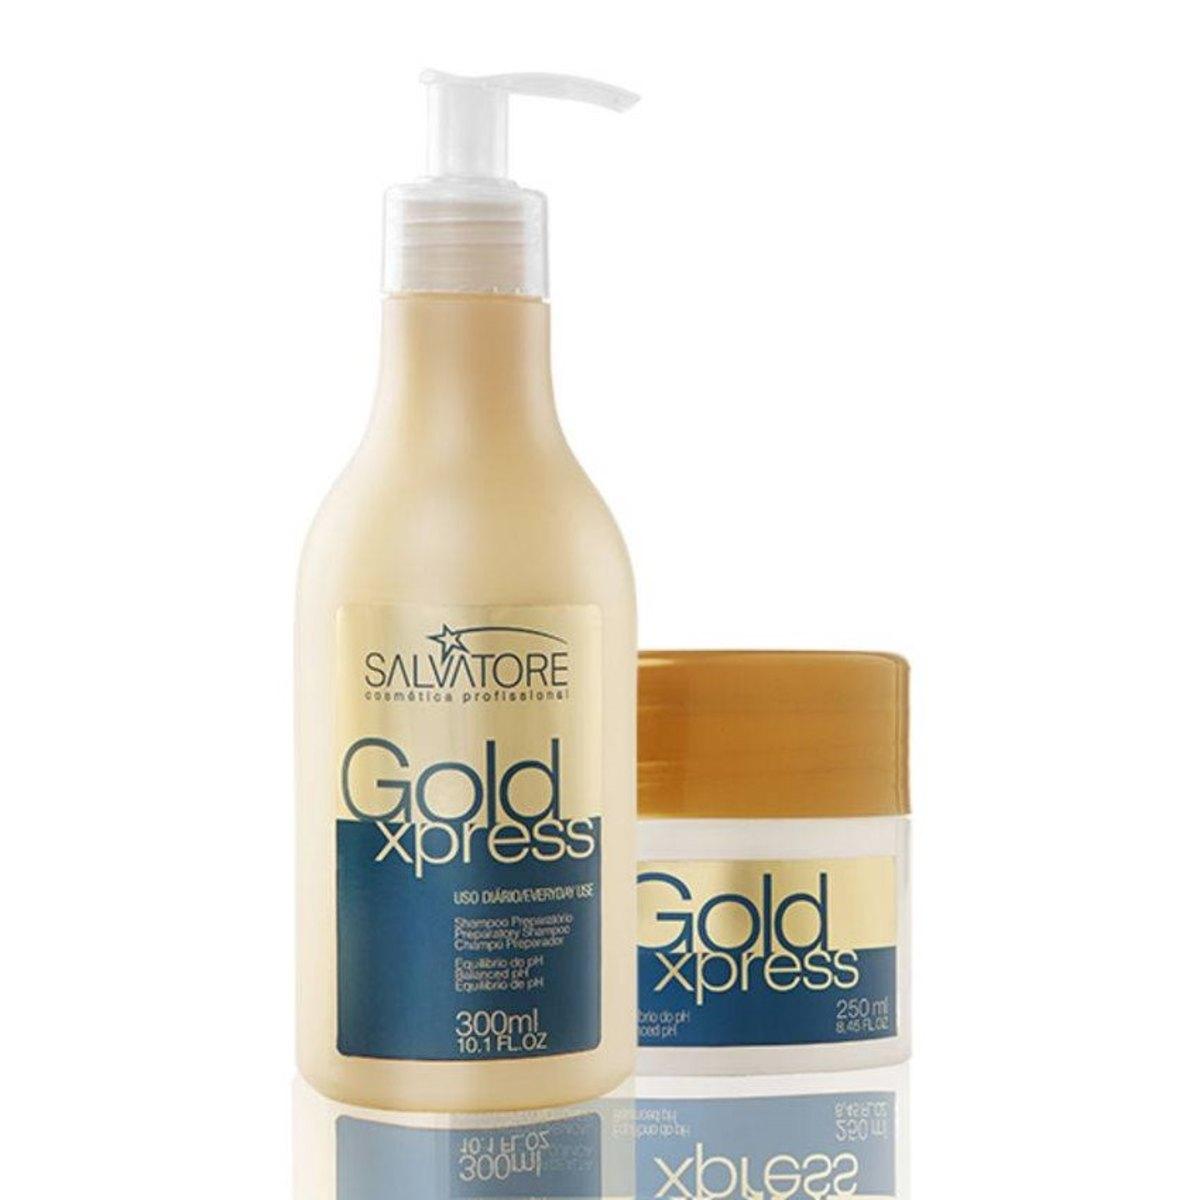 Salvatore Shampoo 300ml + Máscara Salvatore Gold Xpress 250ml - R